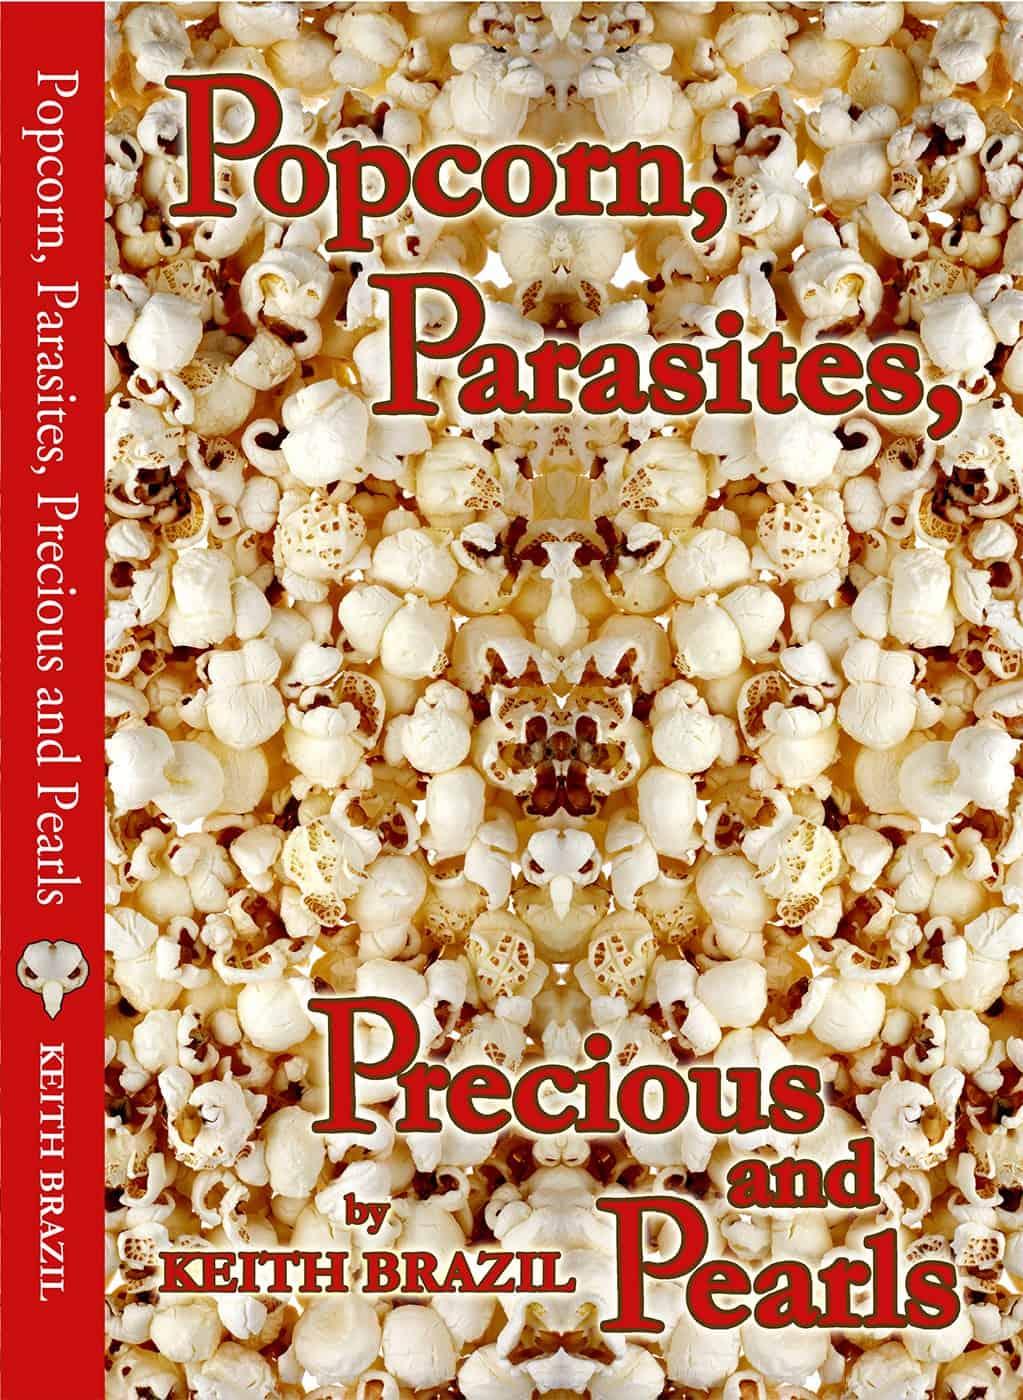 Popcorn, Parasites, Precious & Perals